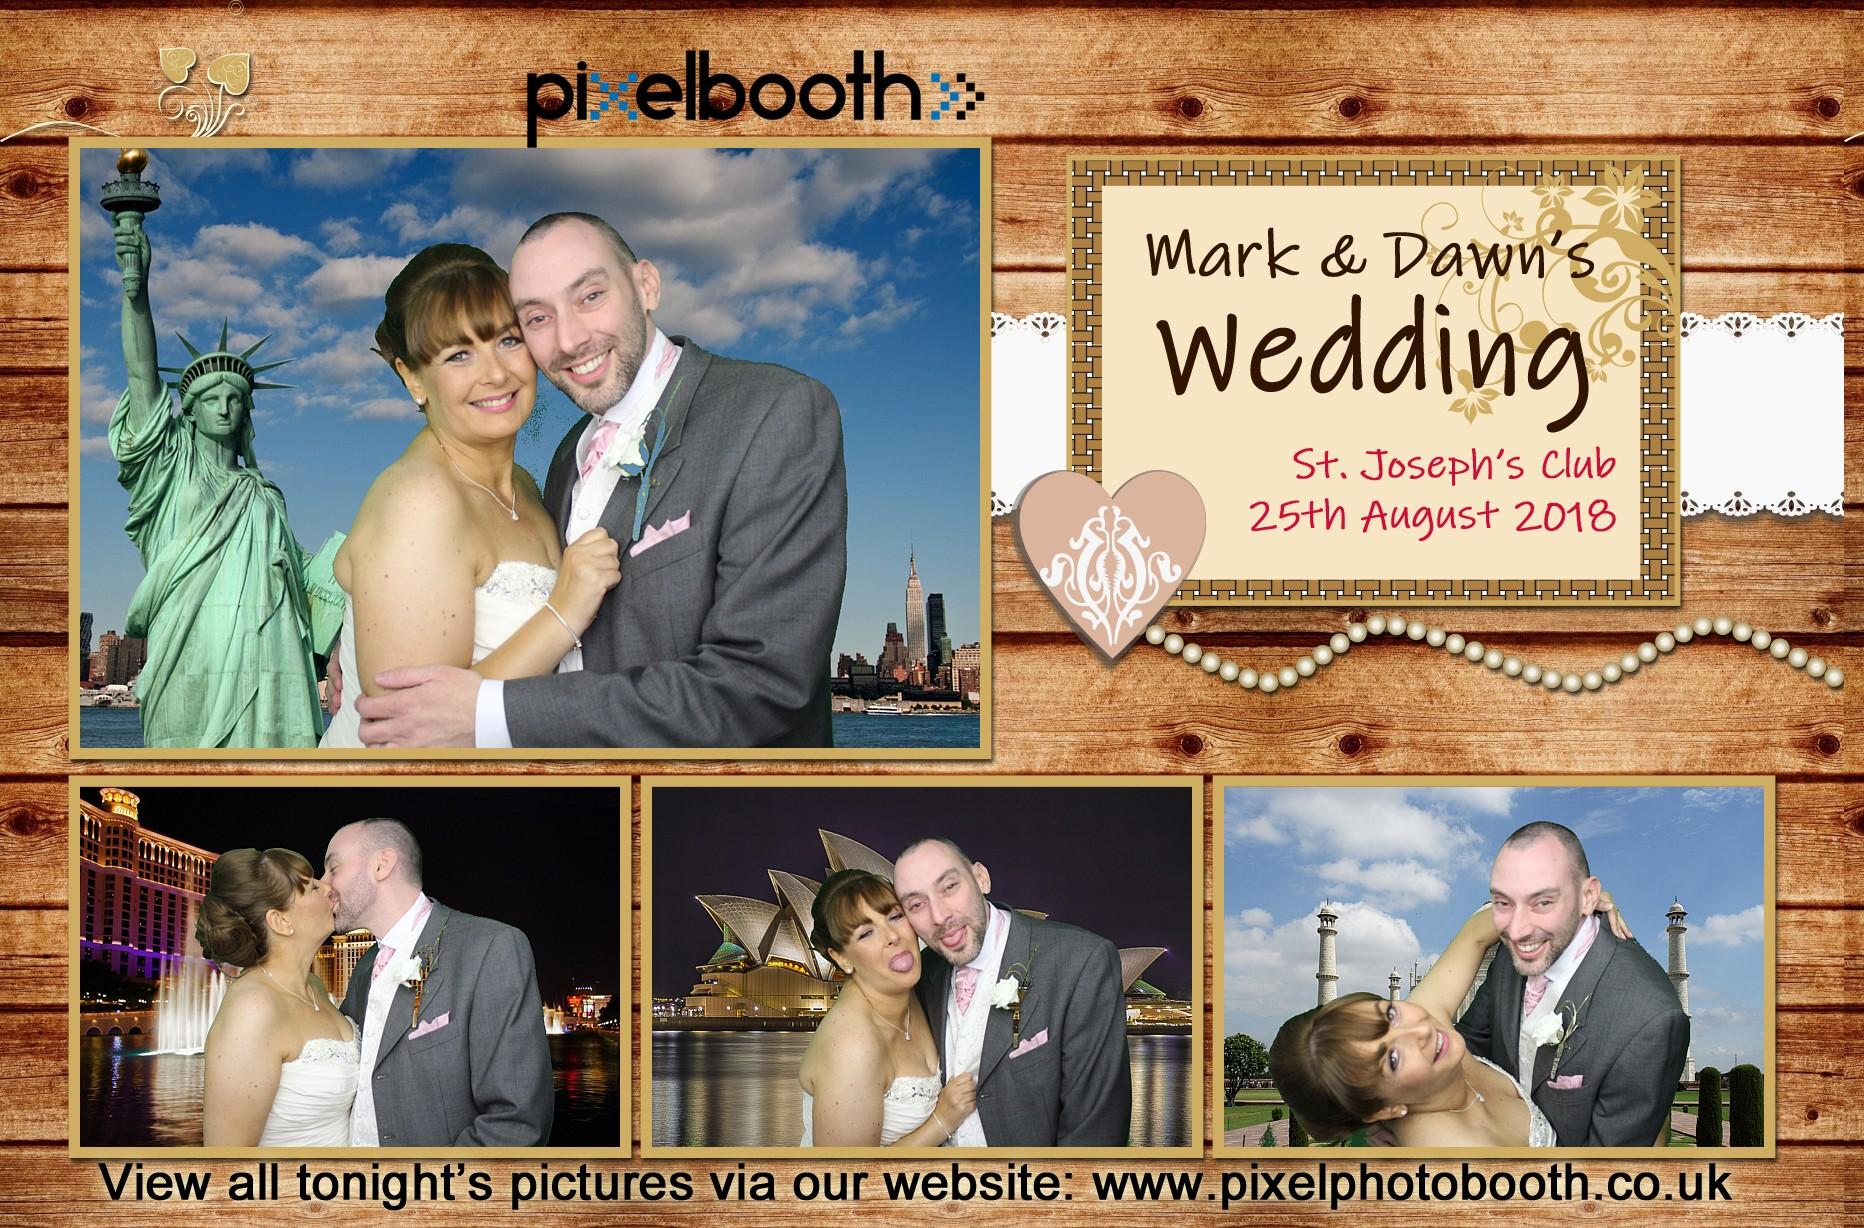 25th Aug 2018: Mark & Dawn's Wedding at St. Joseph's